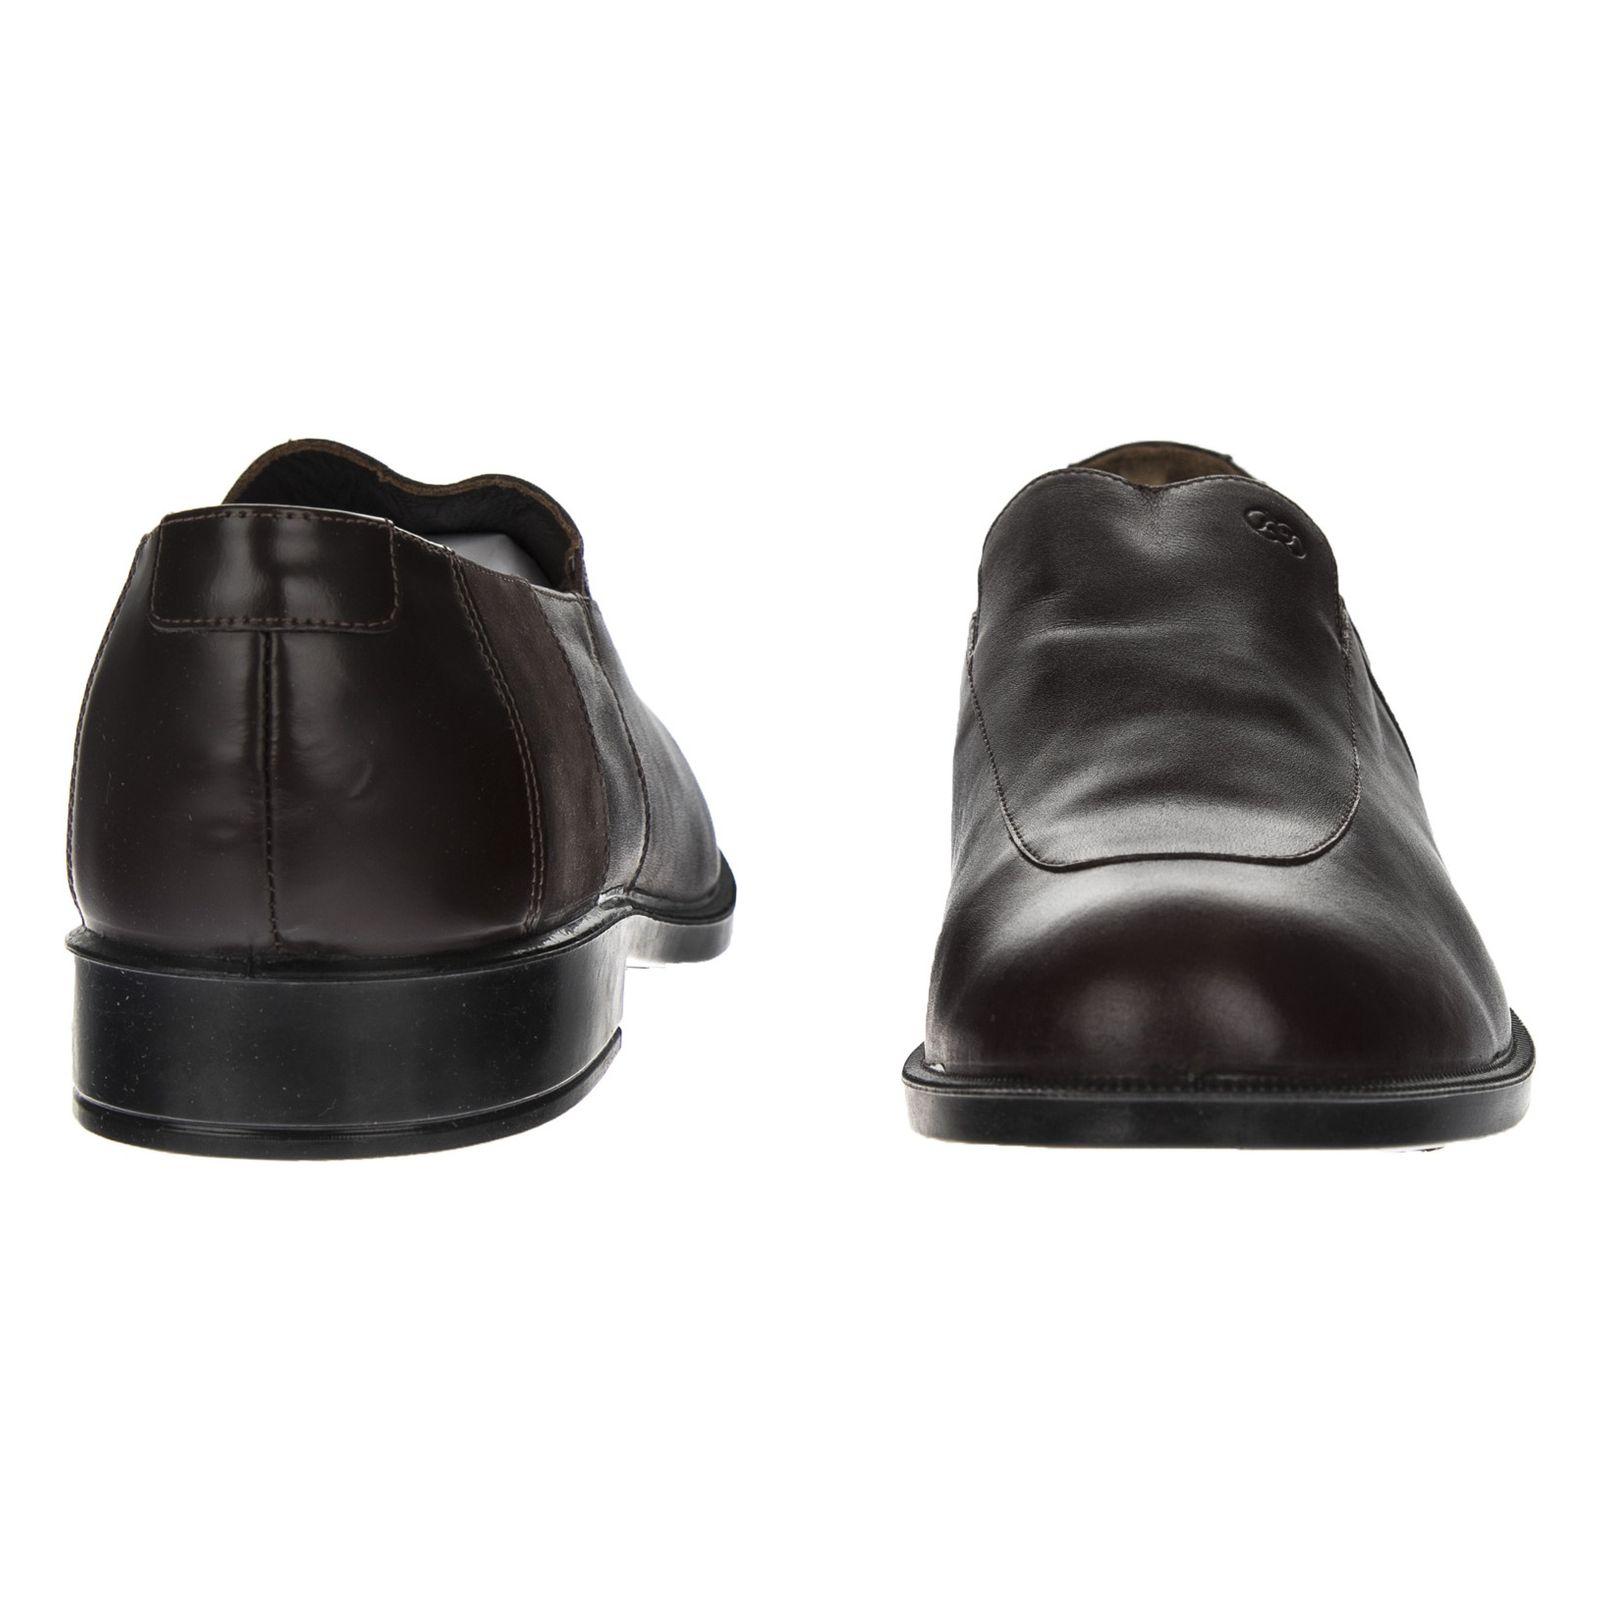 کفش مردانه دنیلی مدل 209110136019 -  - 6